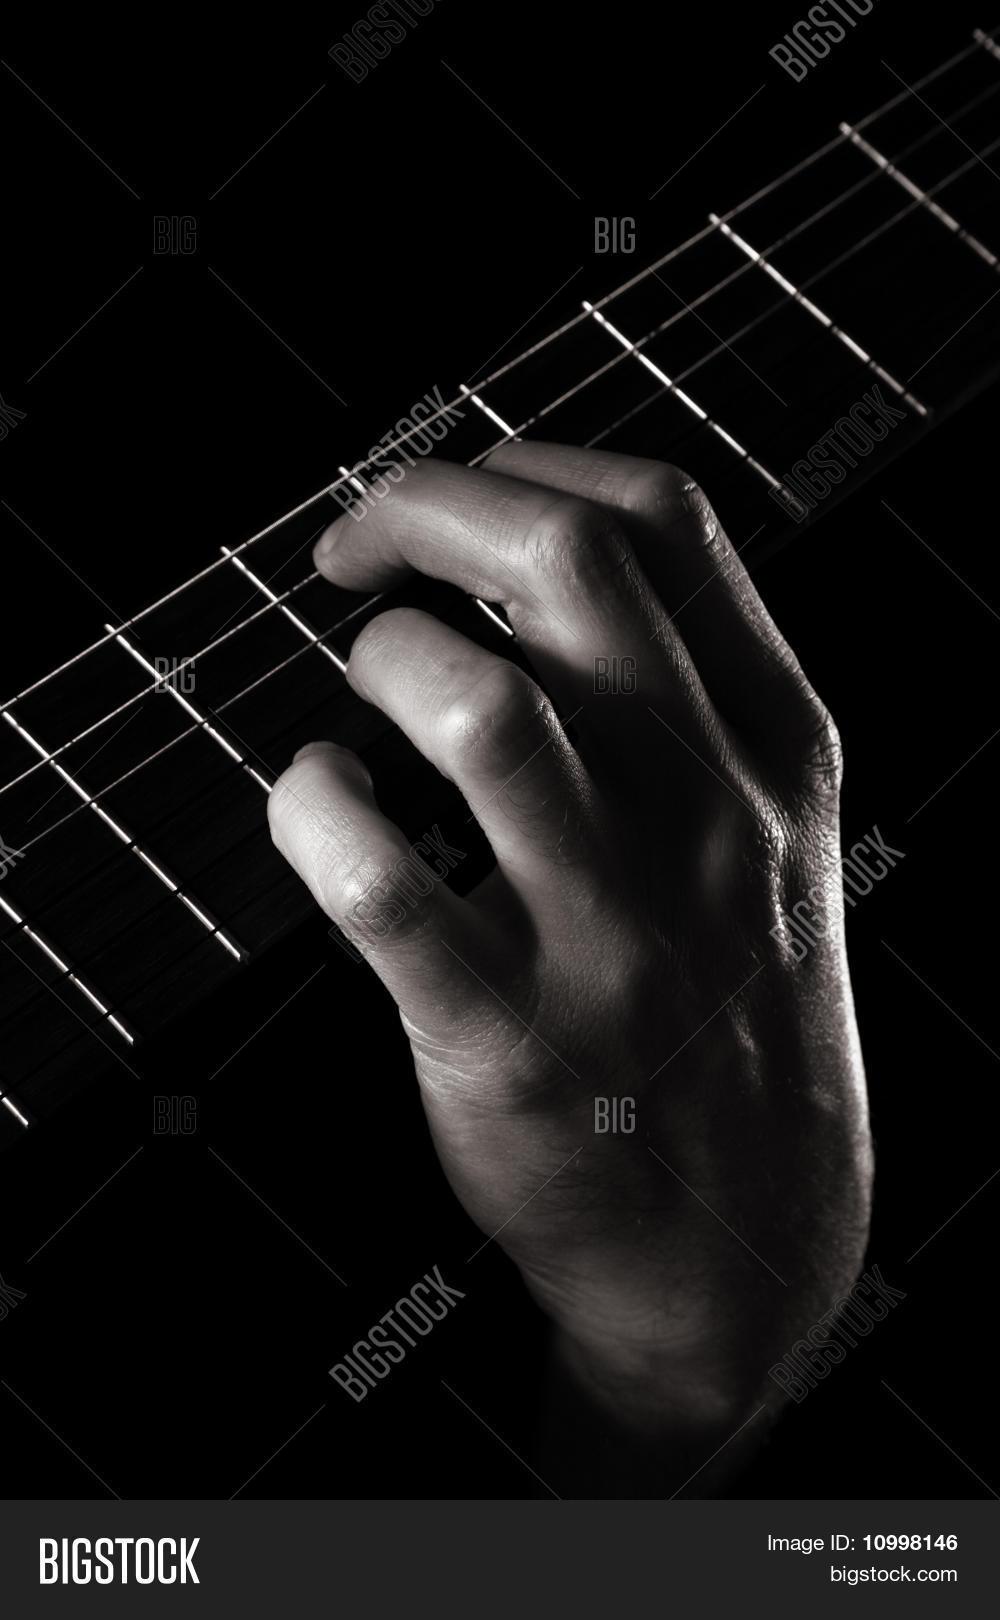 E79 Dominant Seventh Augmented Ninth Chord Aka Hendrix Chord